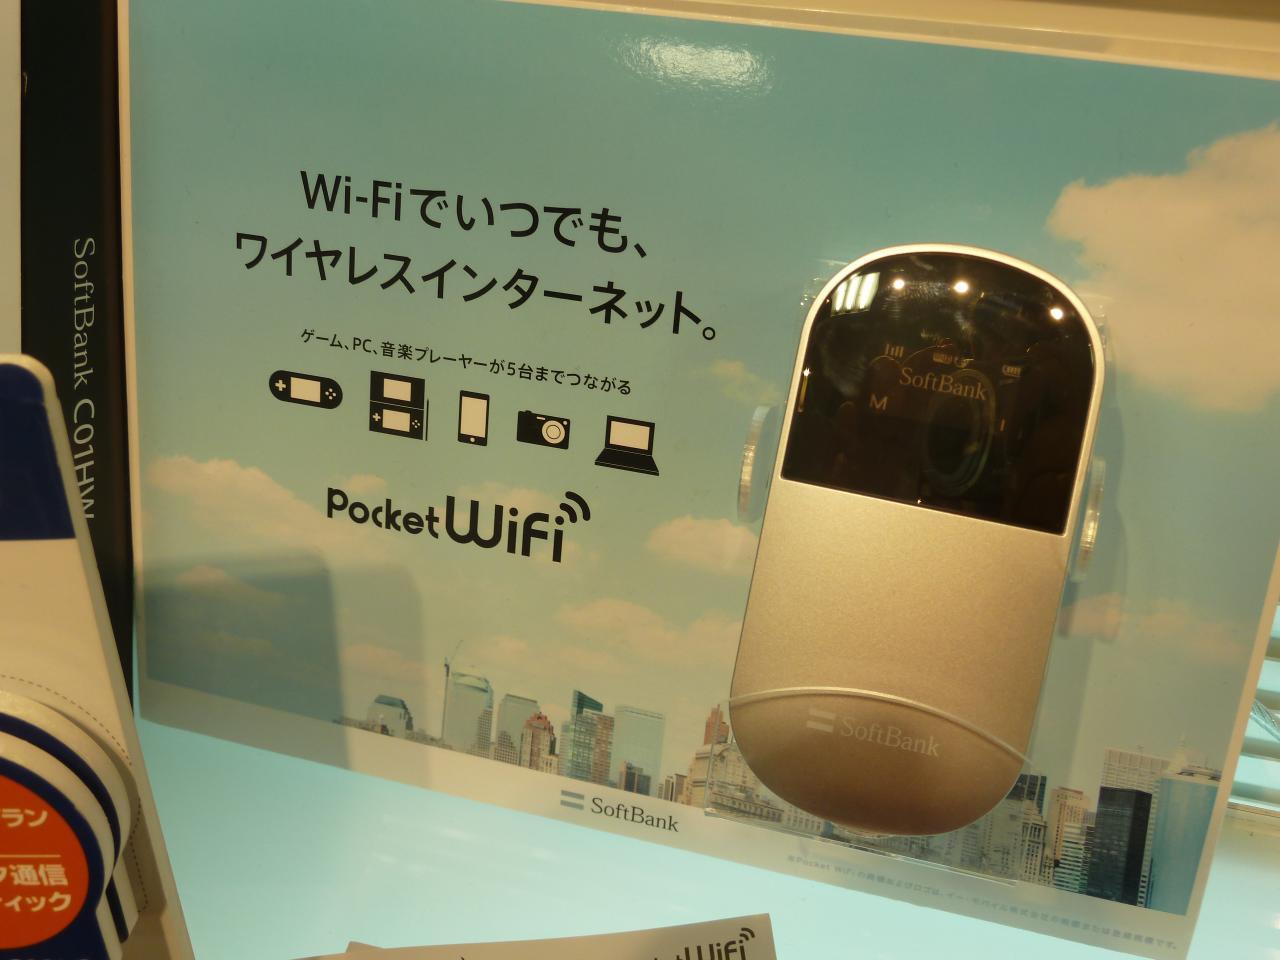 Wifi personal hotspot